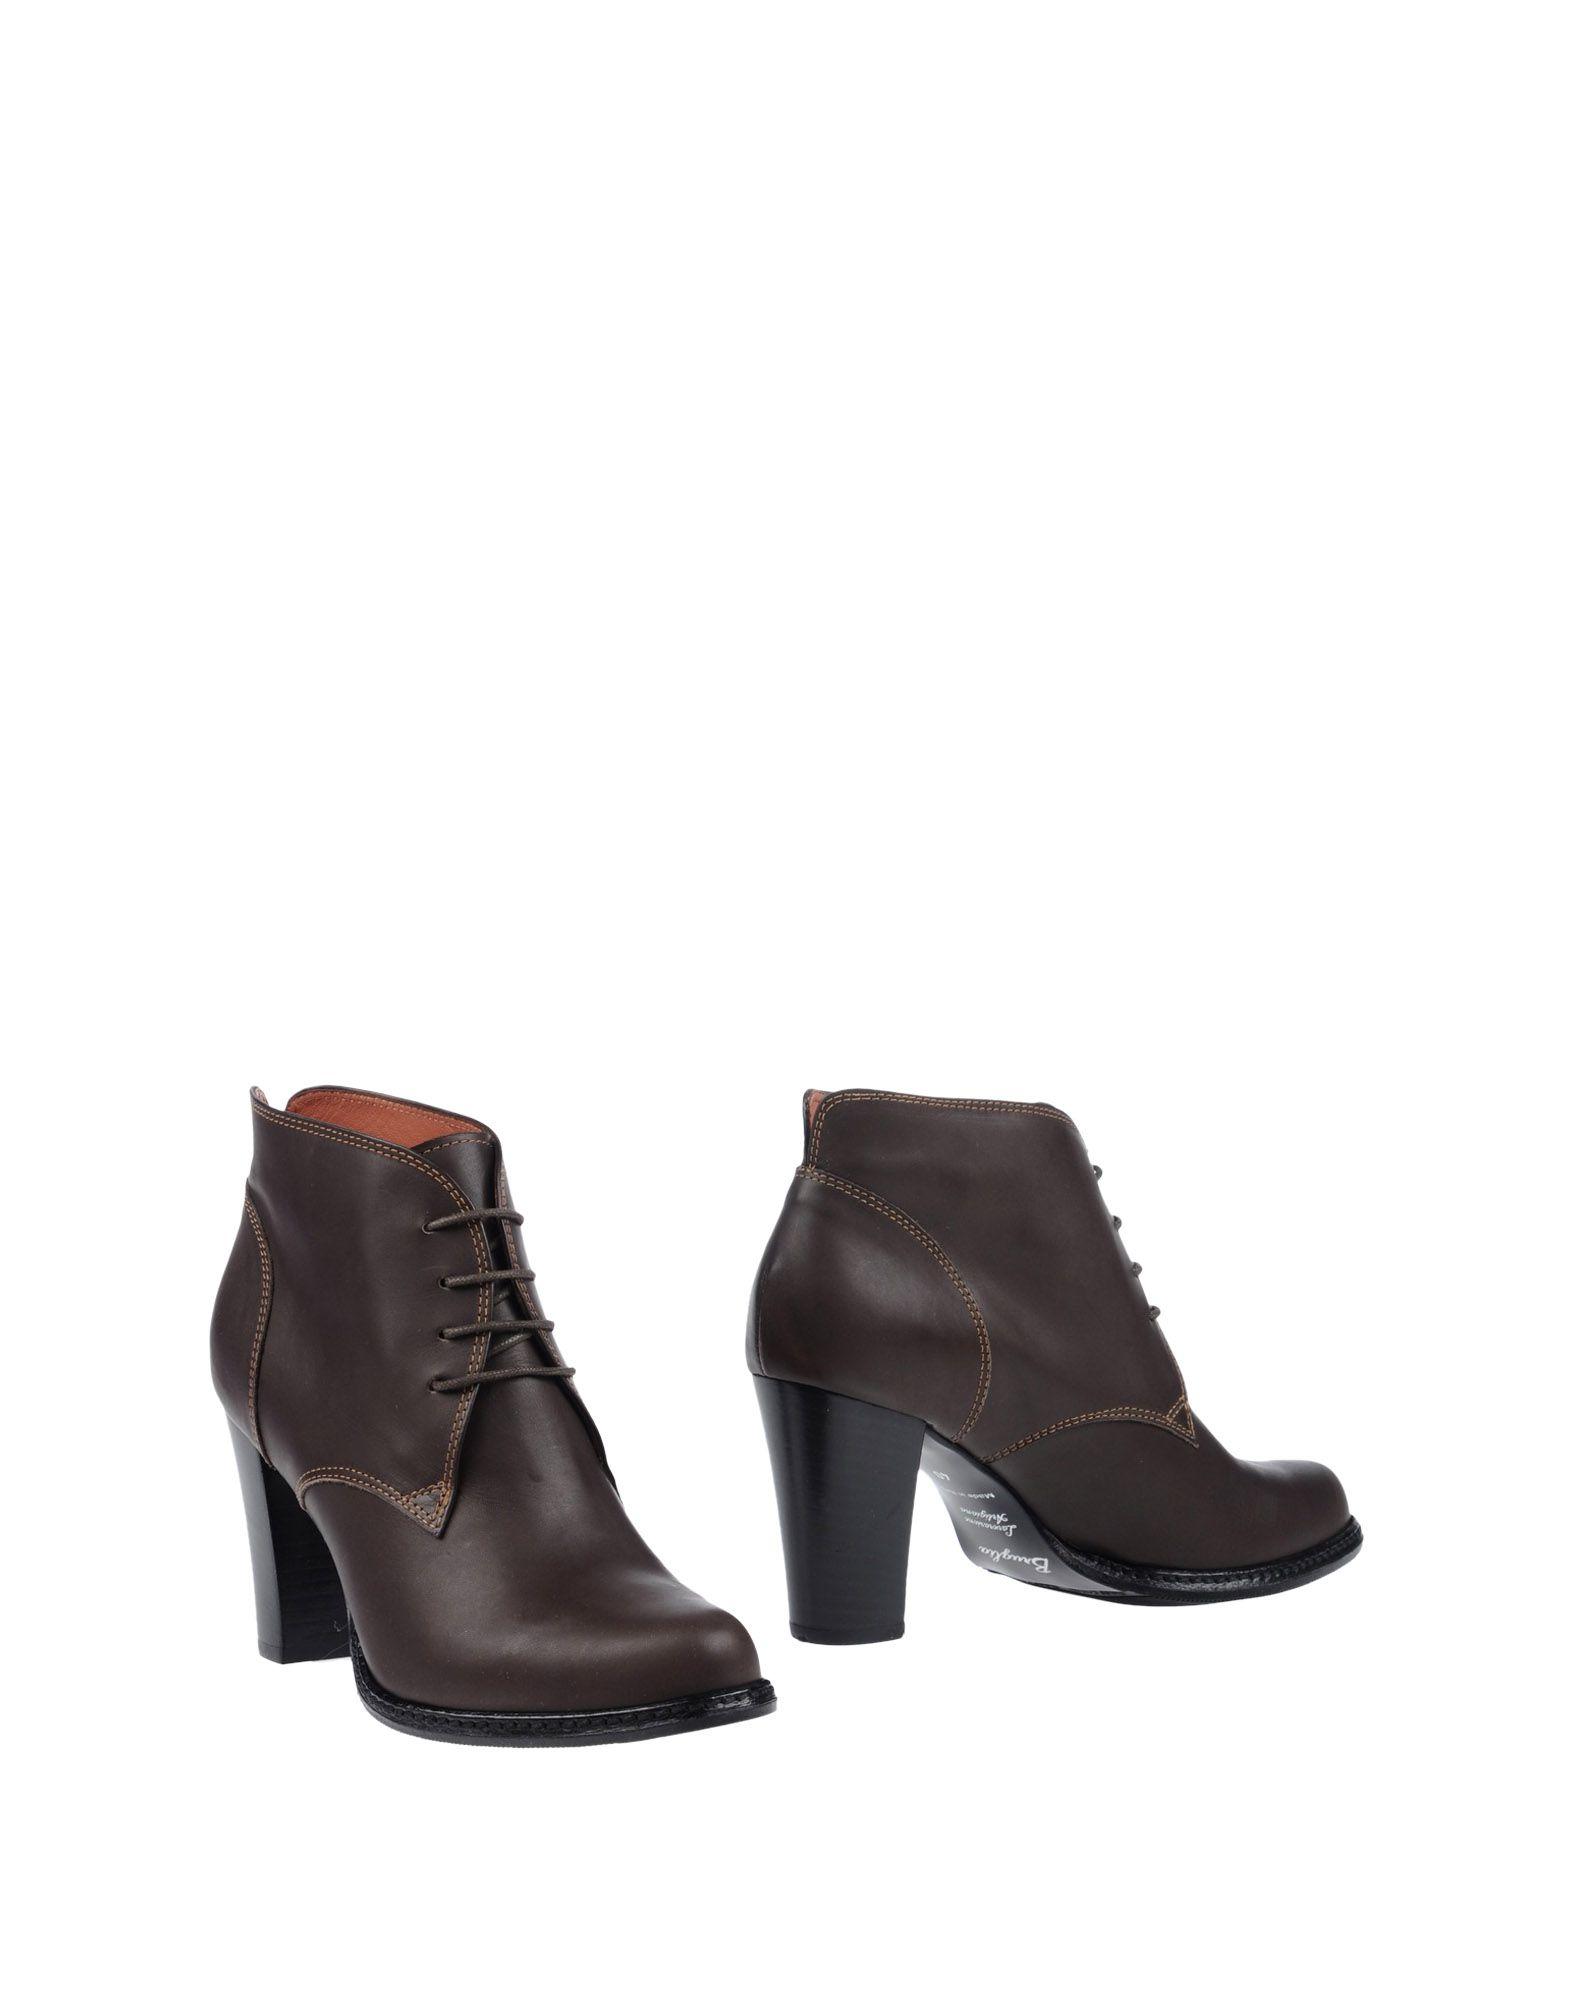 F.Lli Bruglia Stiefelette Damen  beliebte 11249384IG Gute Qualität beliebte  Schuhe d6c0ed